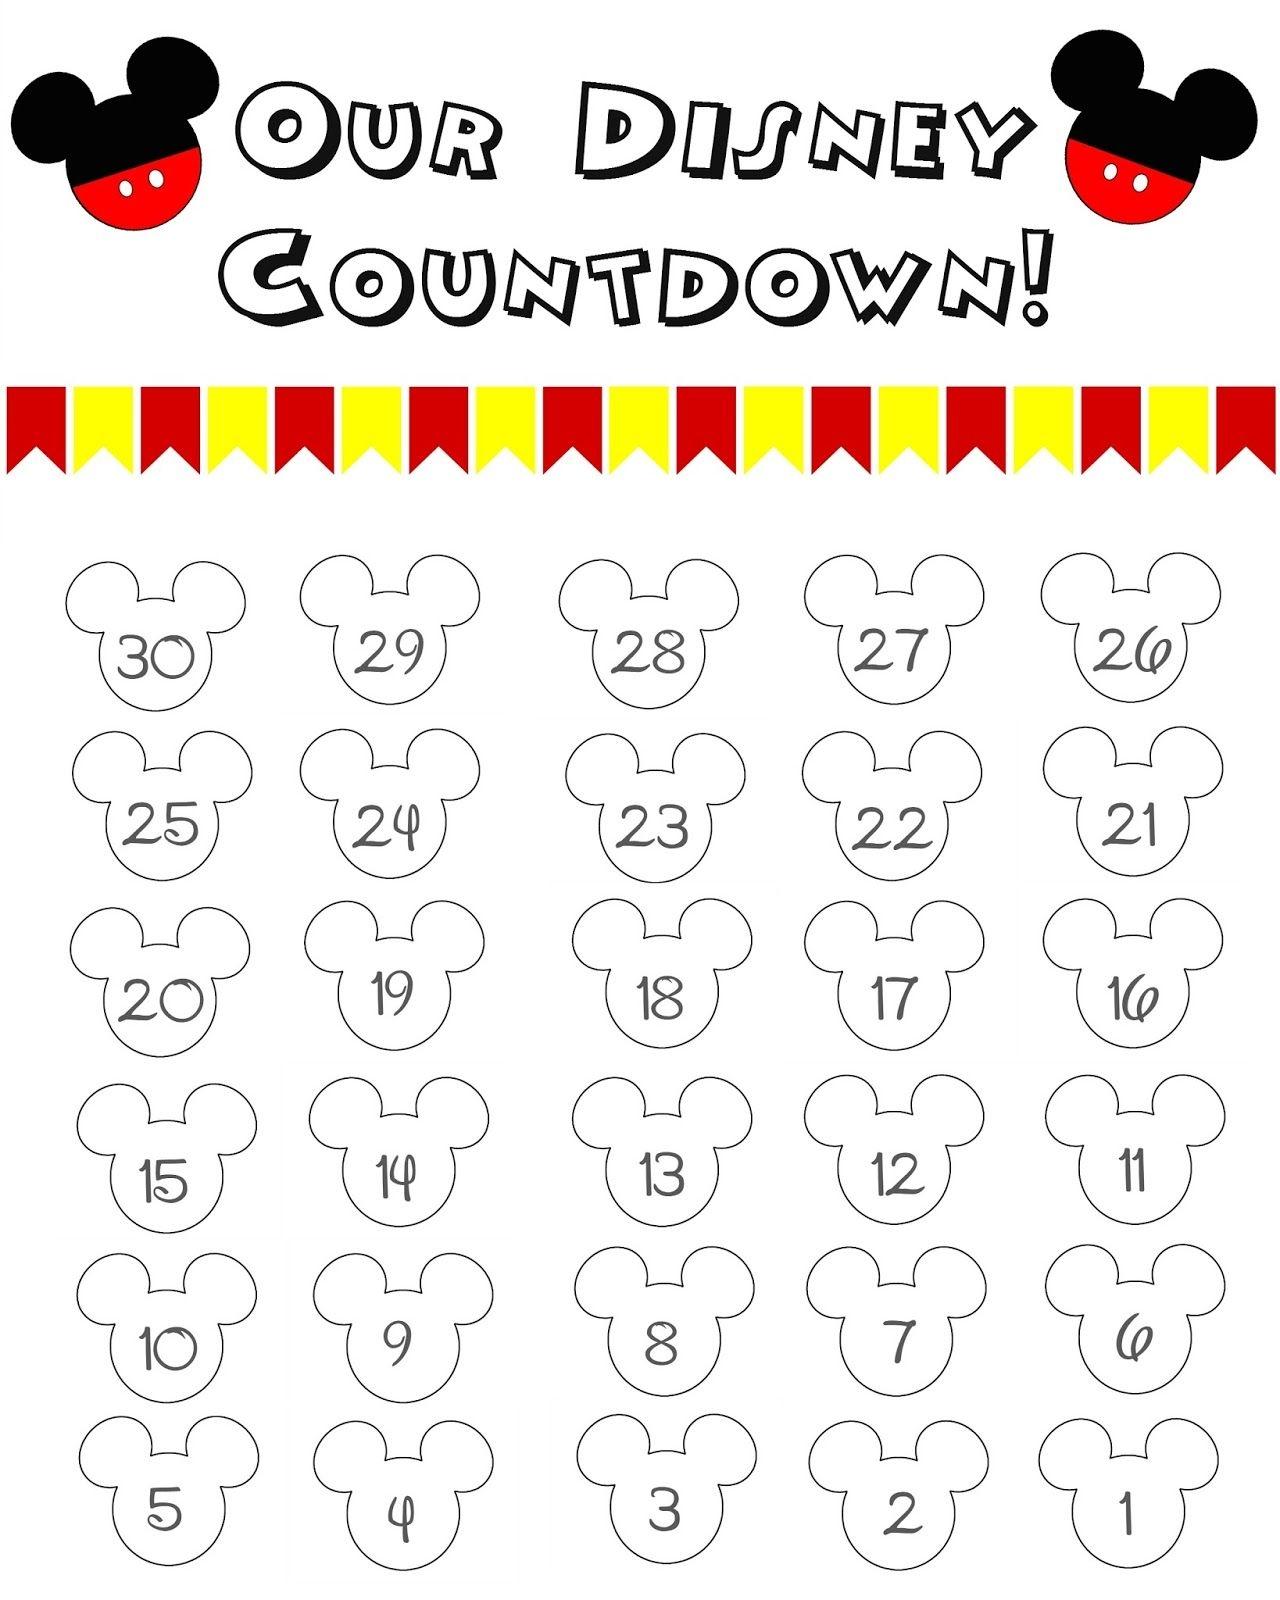 Disney World Countdown Calendar Free Printable The Momma Diaries